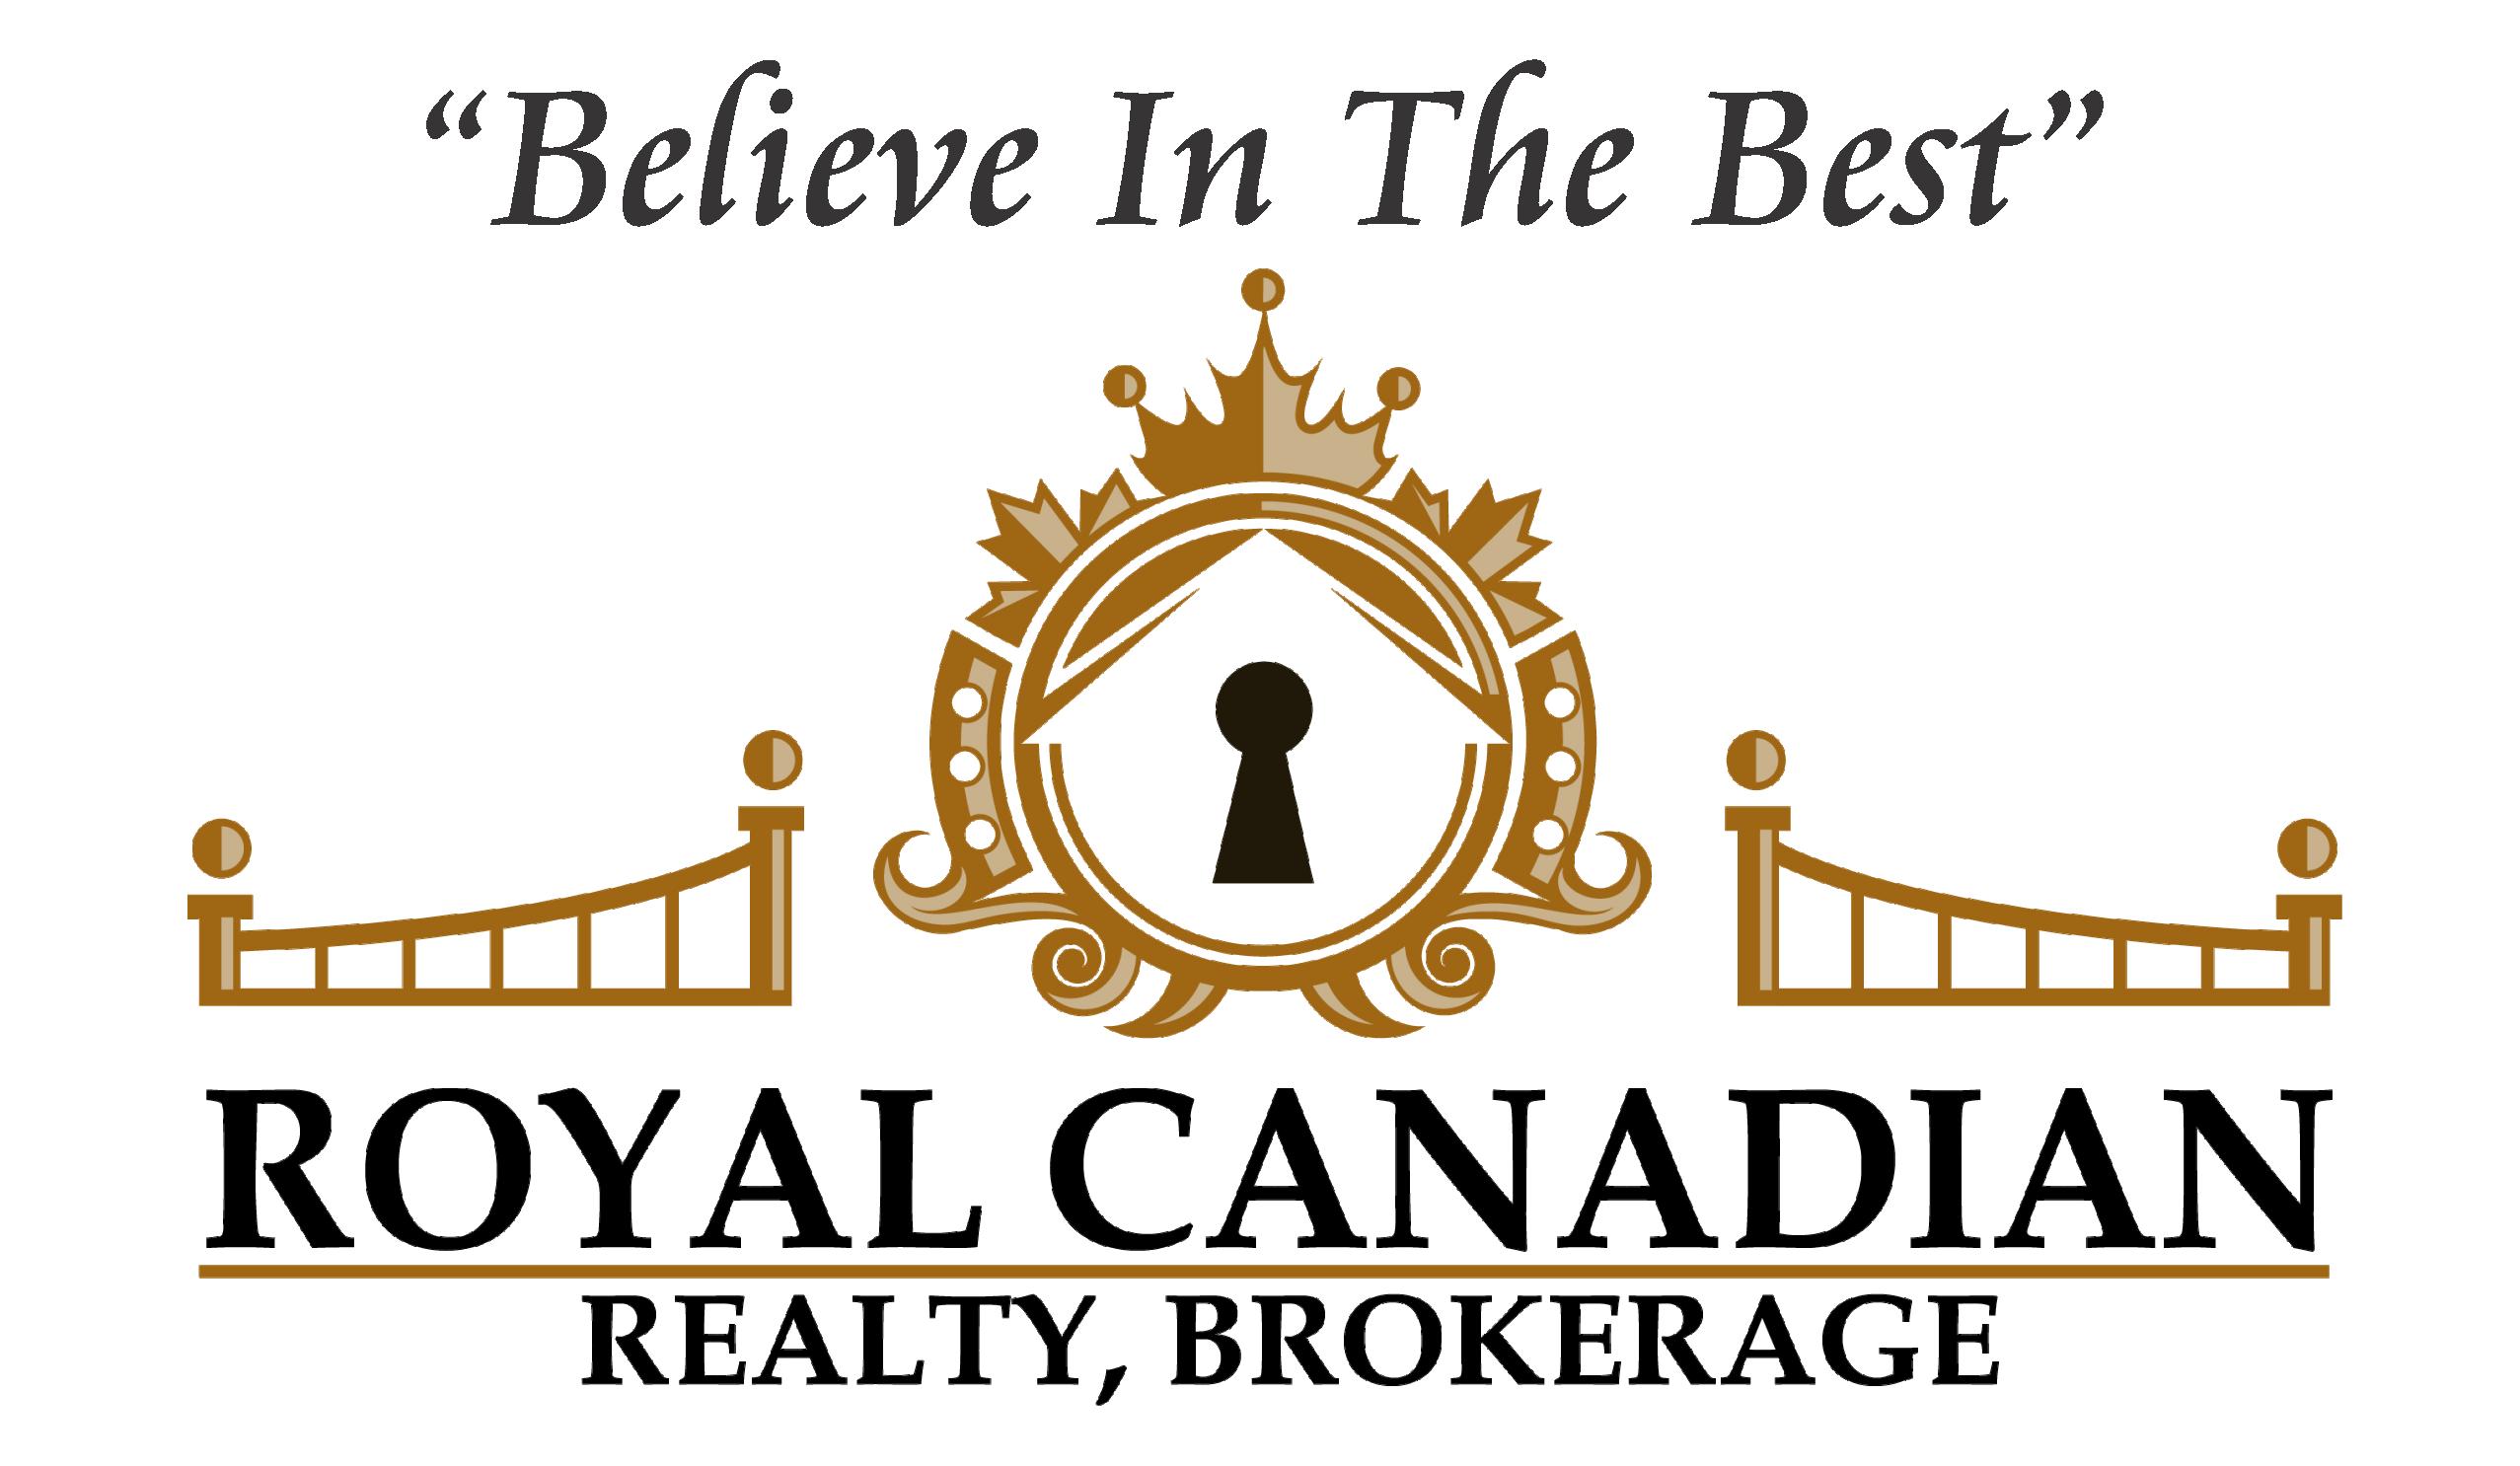 Royal Canadian Realty, Brokerages